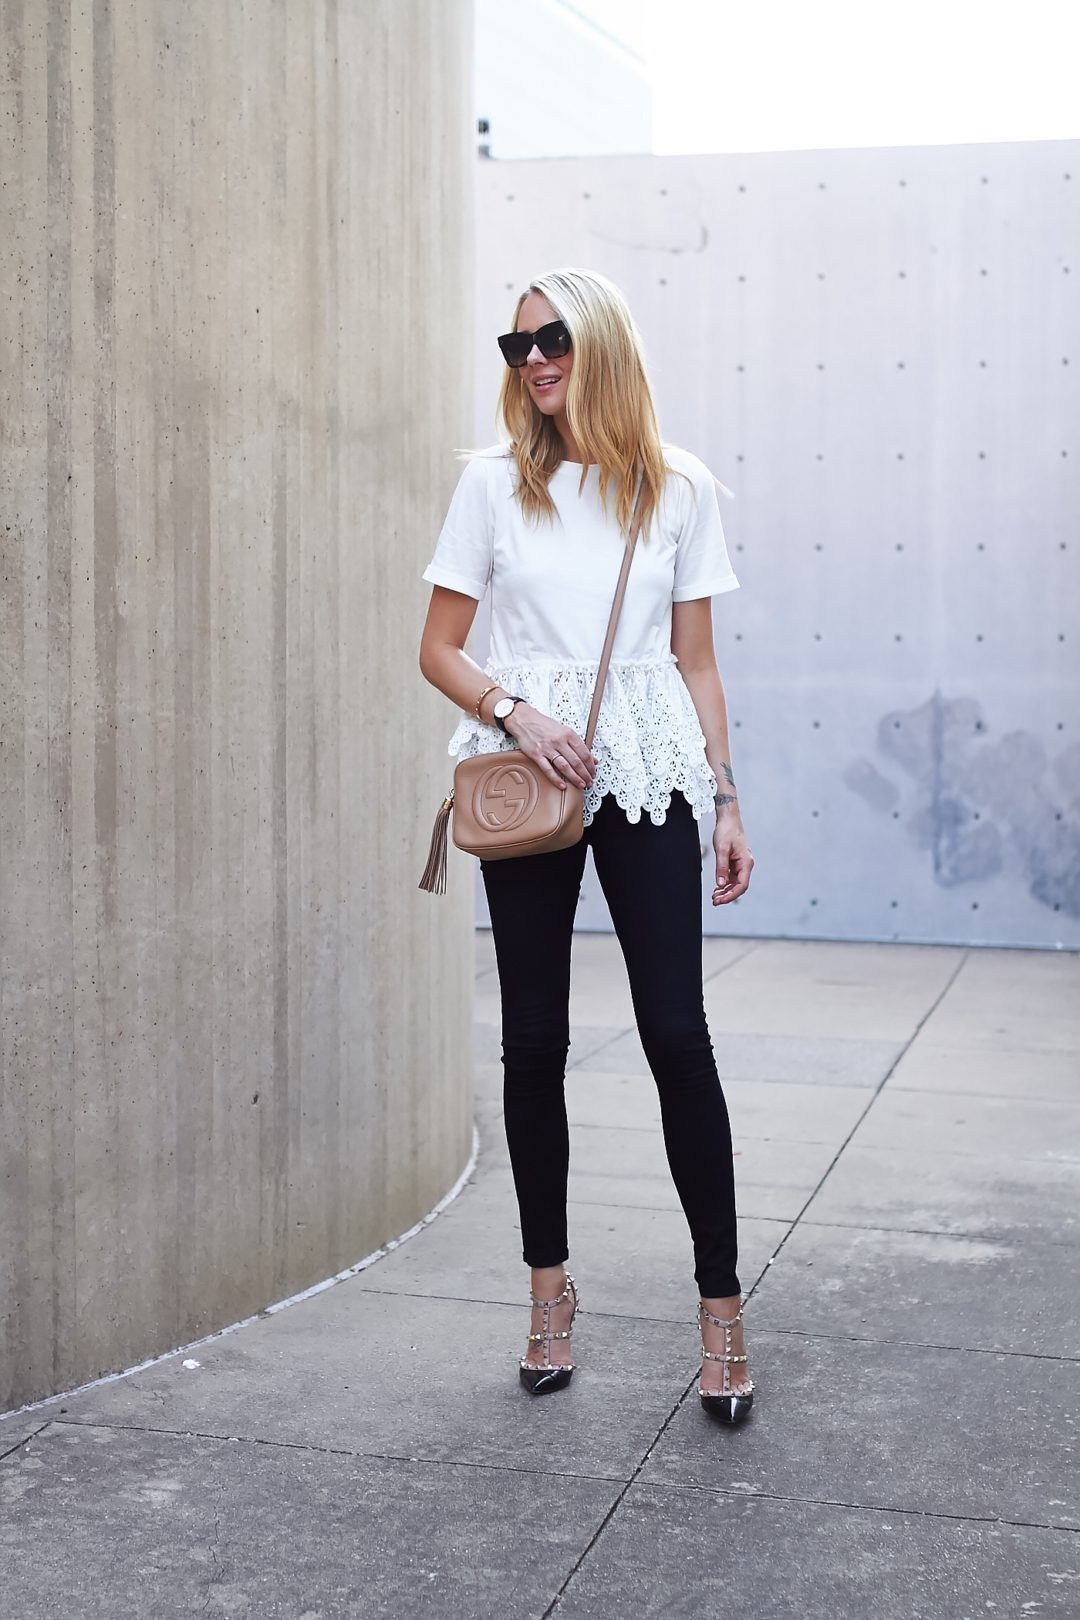 fashion-jackson-valentino-rockstud-pumps-celine-sunglasses-white-lace-tshirt-black-skinny-jeans-valentino-gucci-soho-crossbody